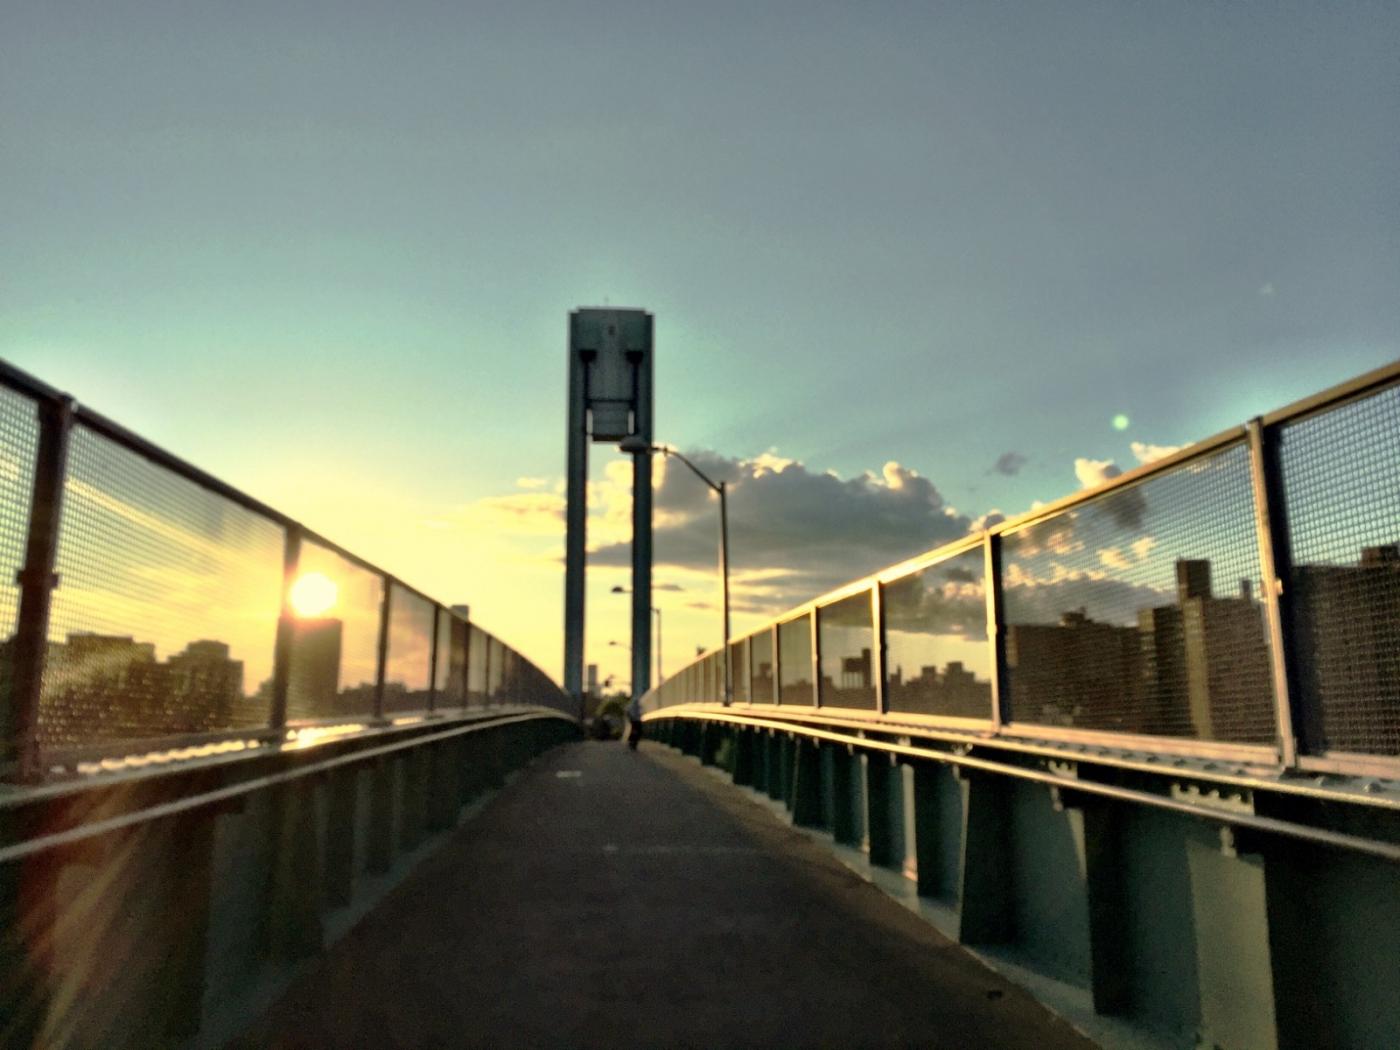 回头一瞅 美在东河 Manhattan East River_图1-18